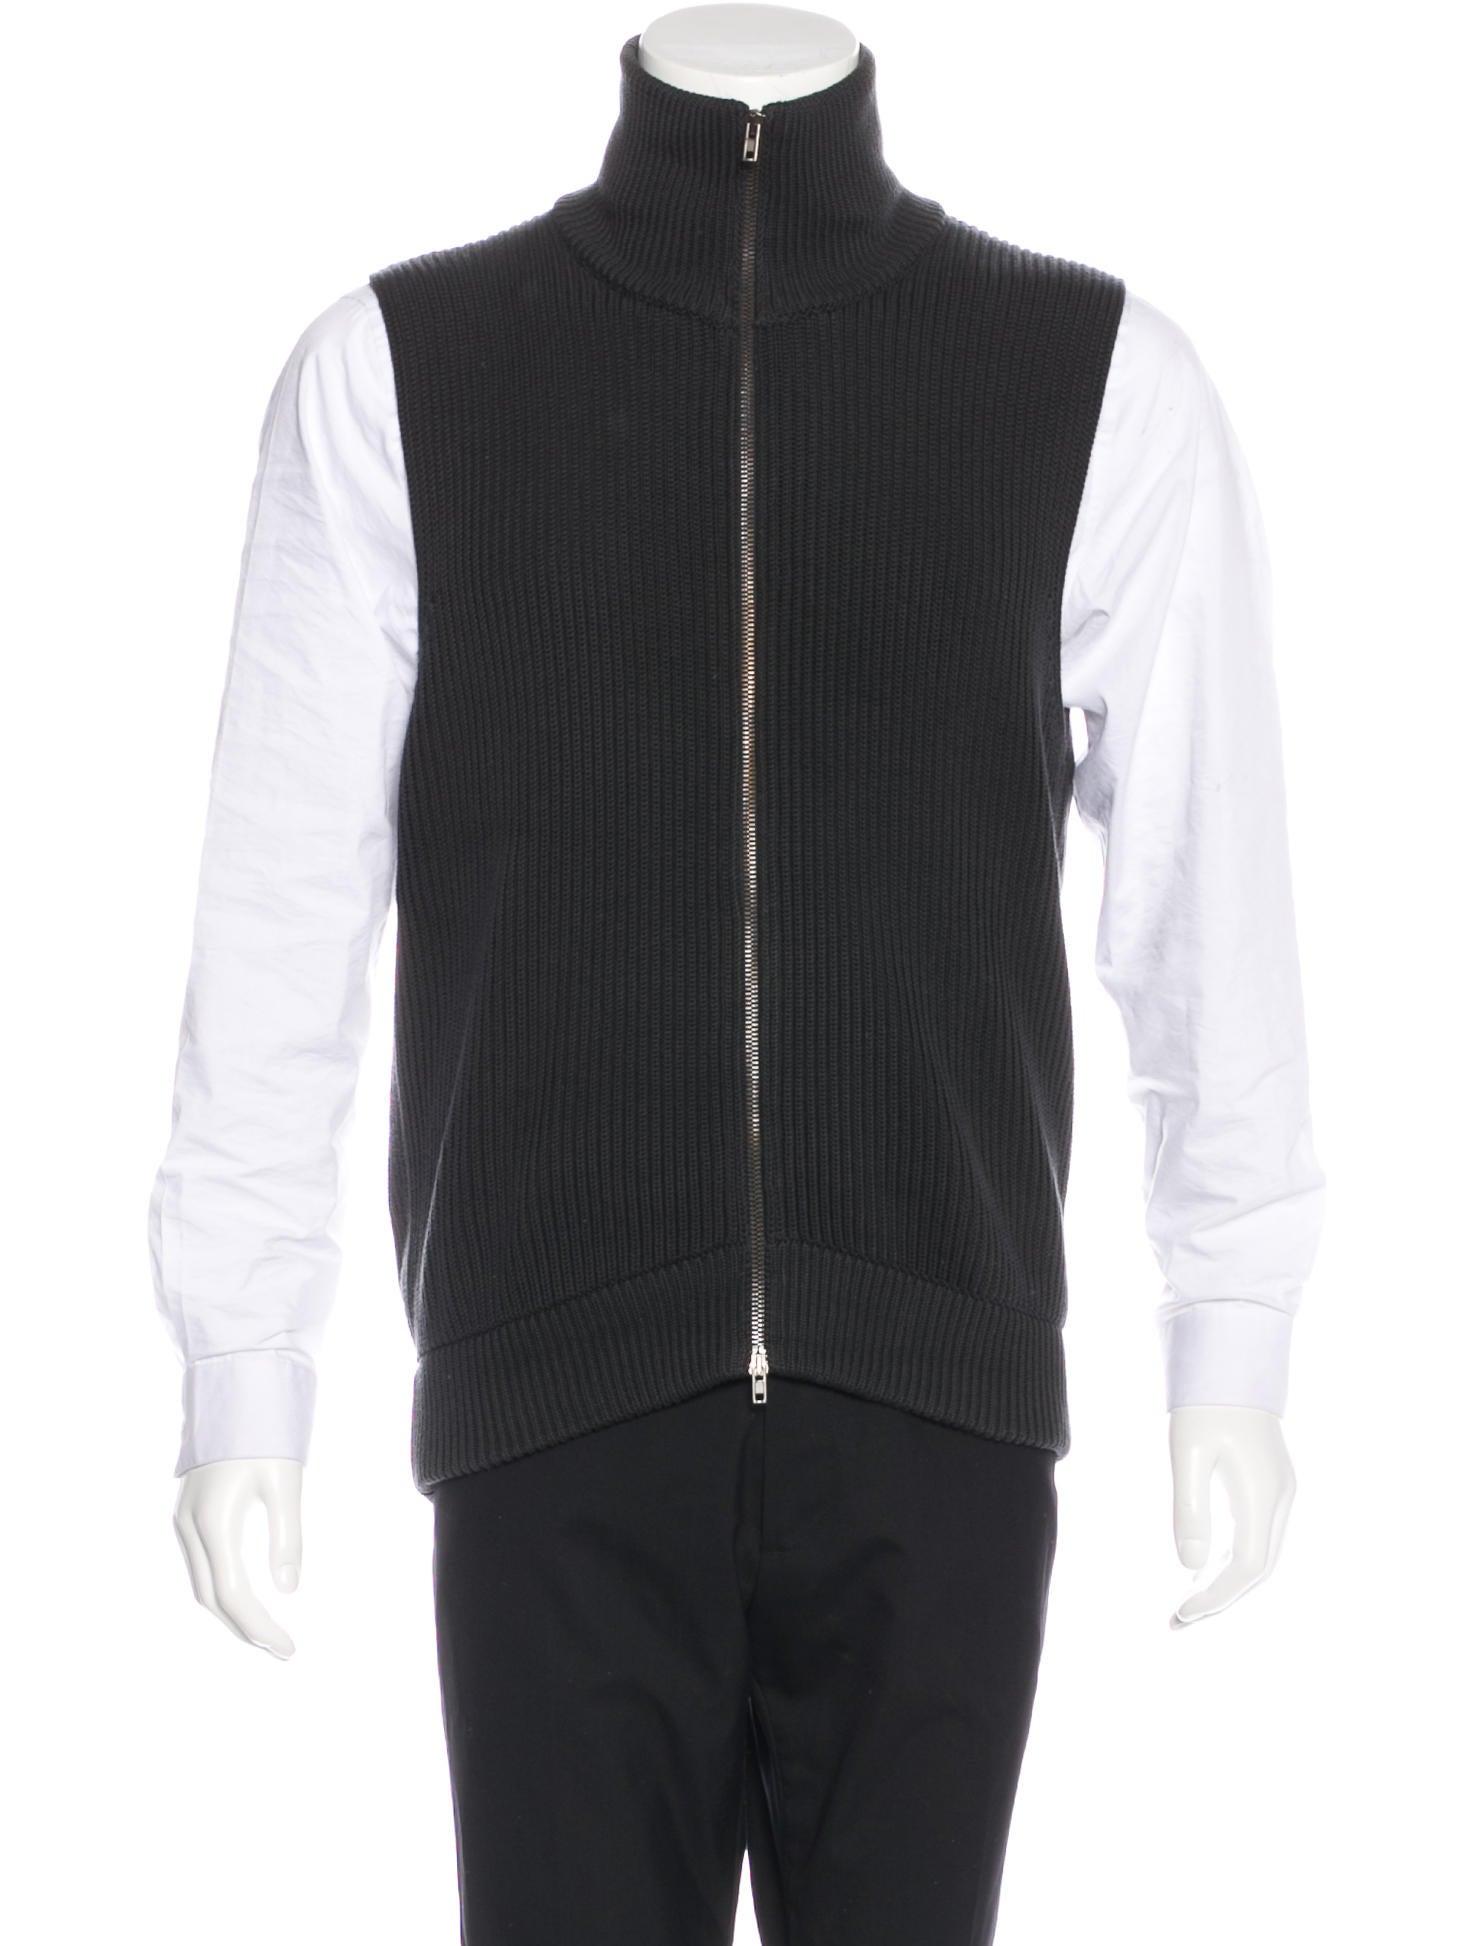 Maison Margiela Zip Sweater Vest - Clothing - MAI29666 | The RealReal